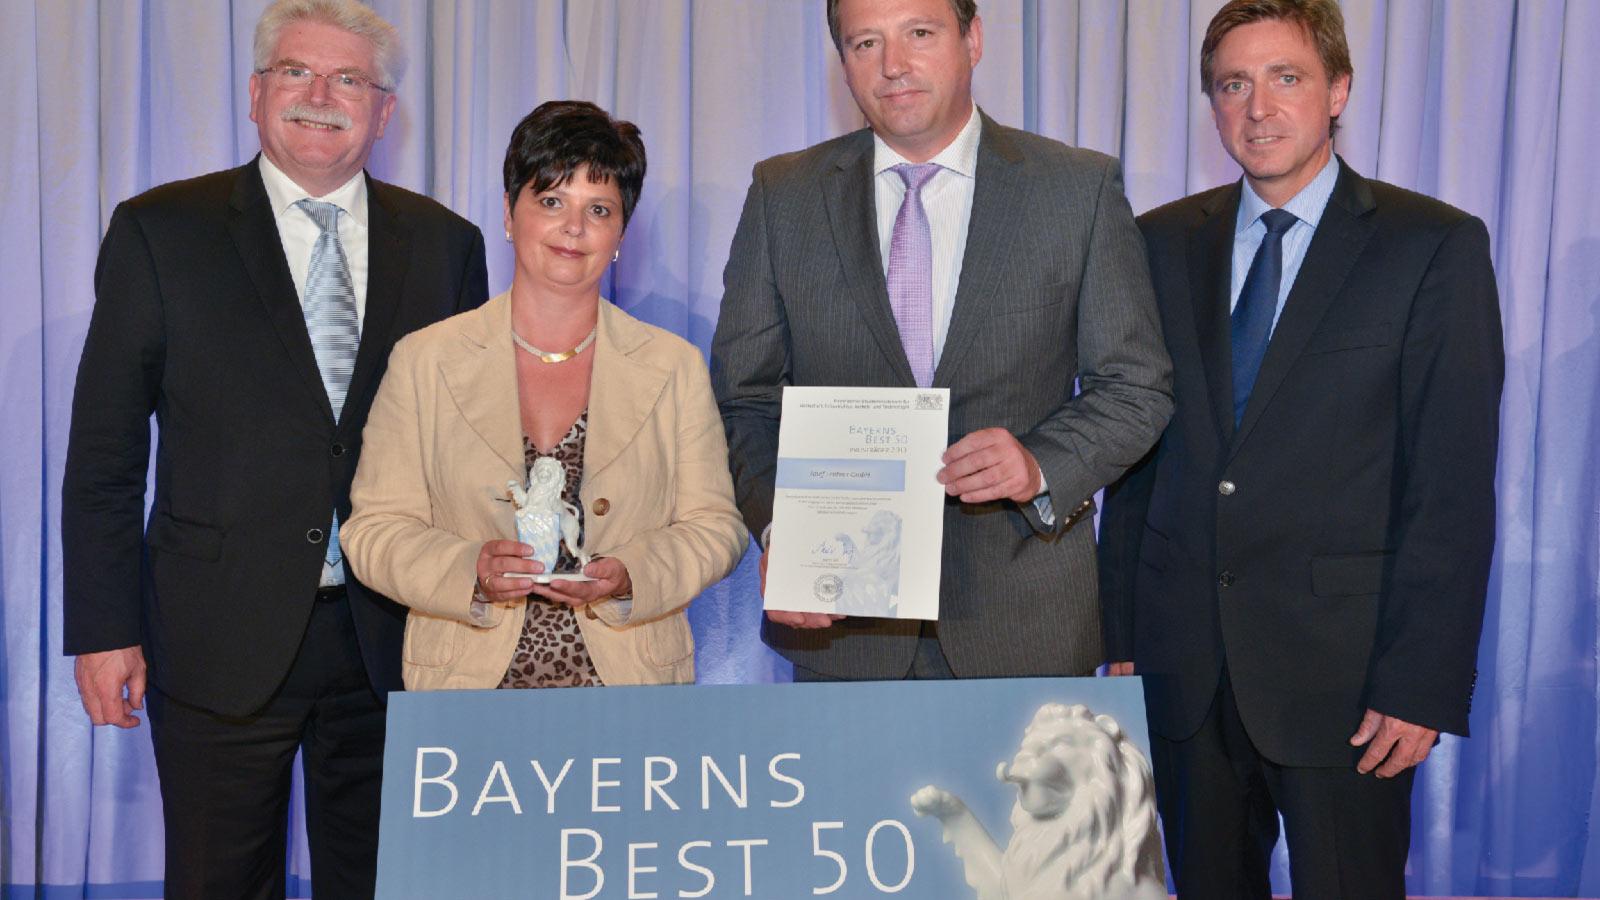 Lentner_BayernsBest50-2013_01.jpg